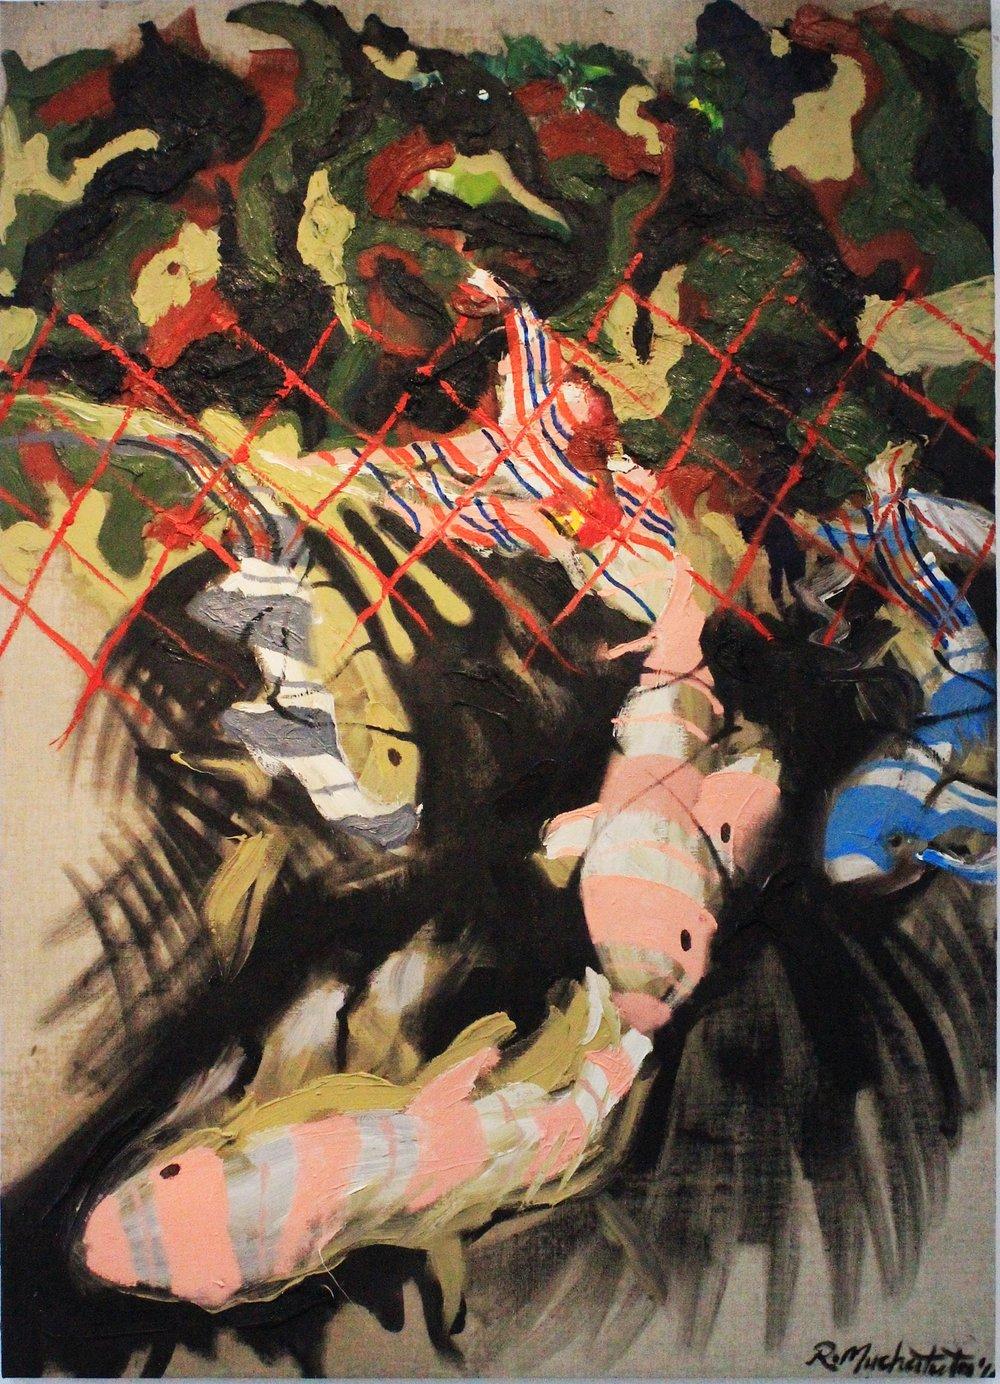 ' The Great Escape'   Ronald Muchatuta  Oil on canvas  1500 x 1100 x 30 mm  R 30 000.00 excl. vat